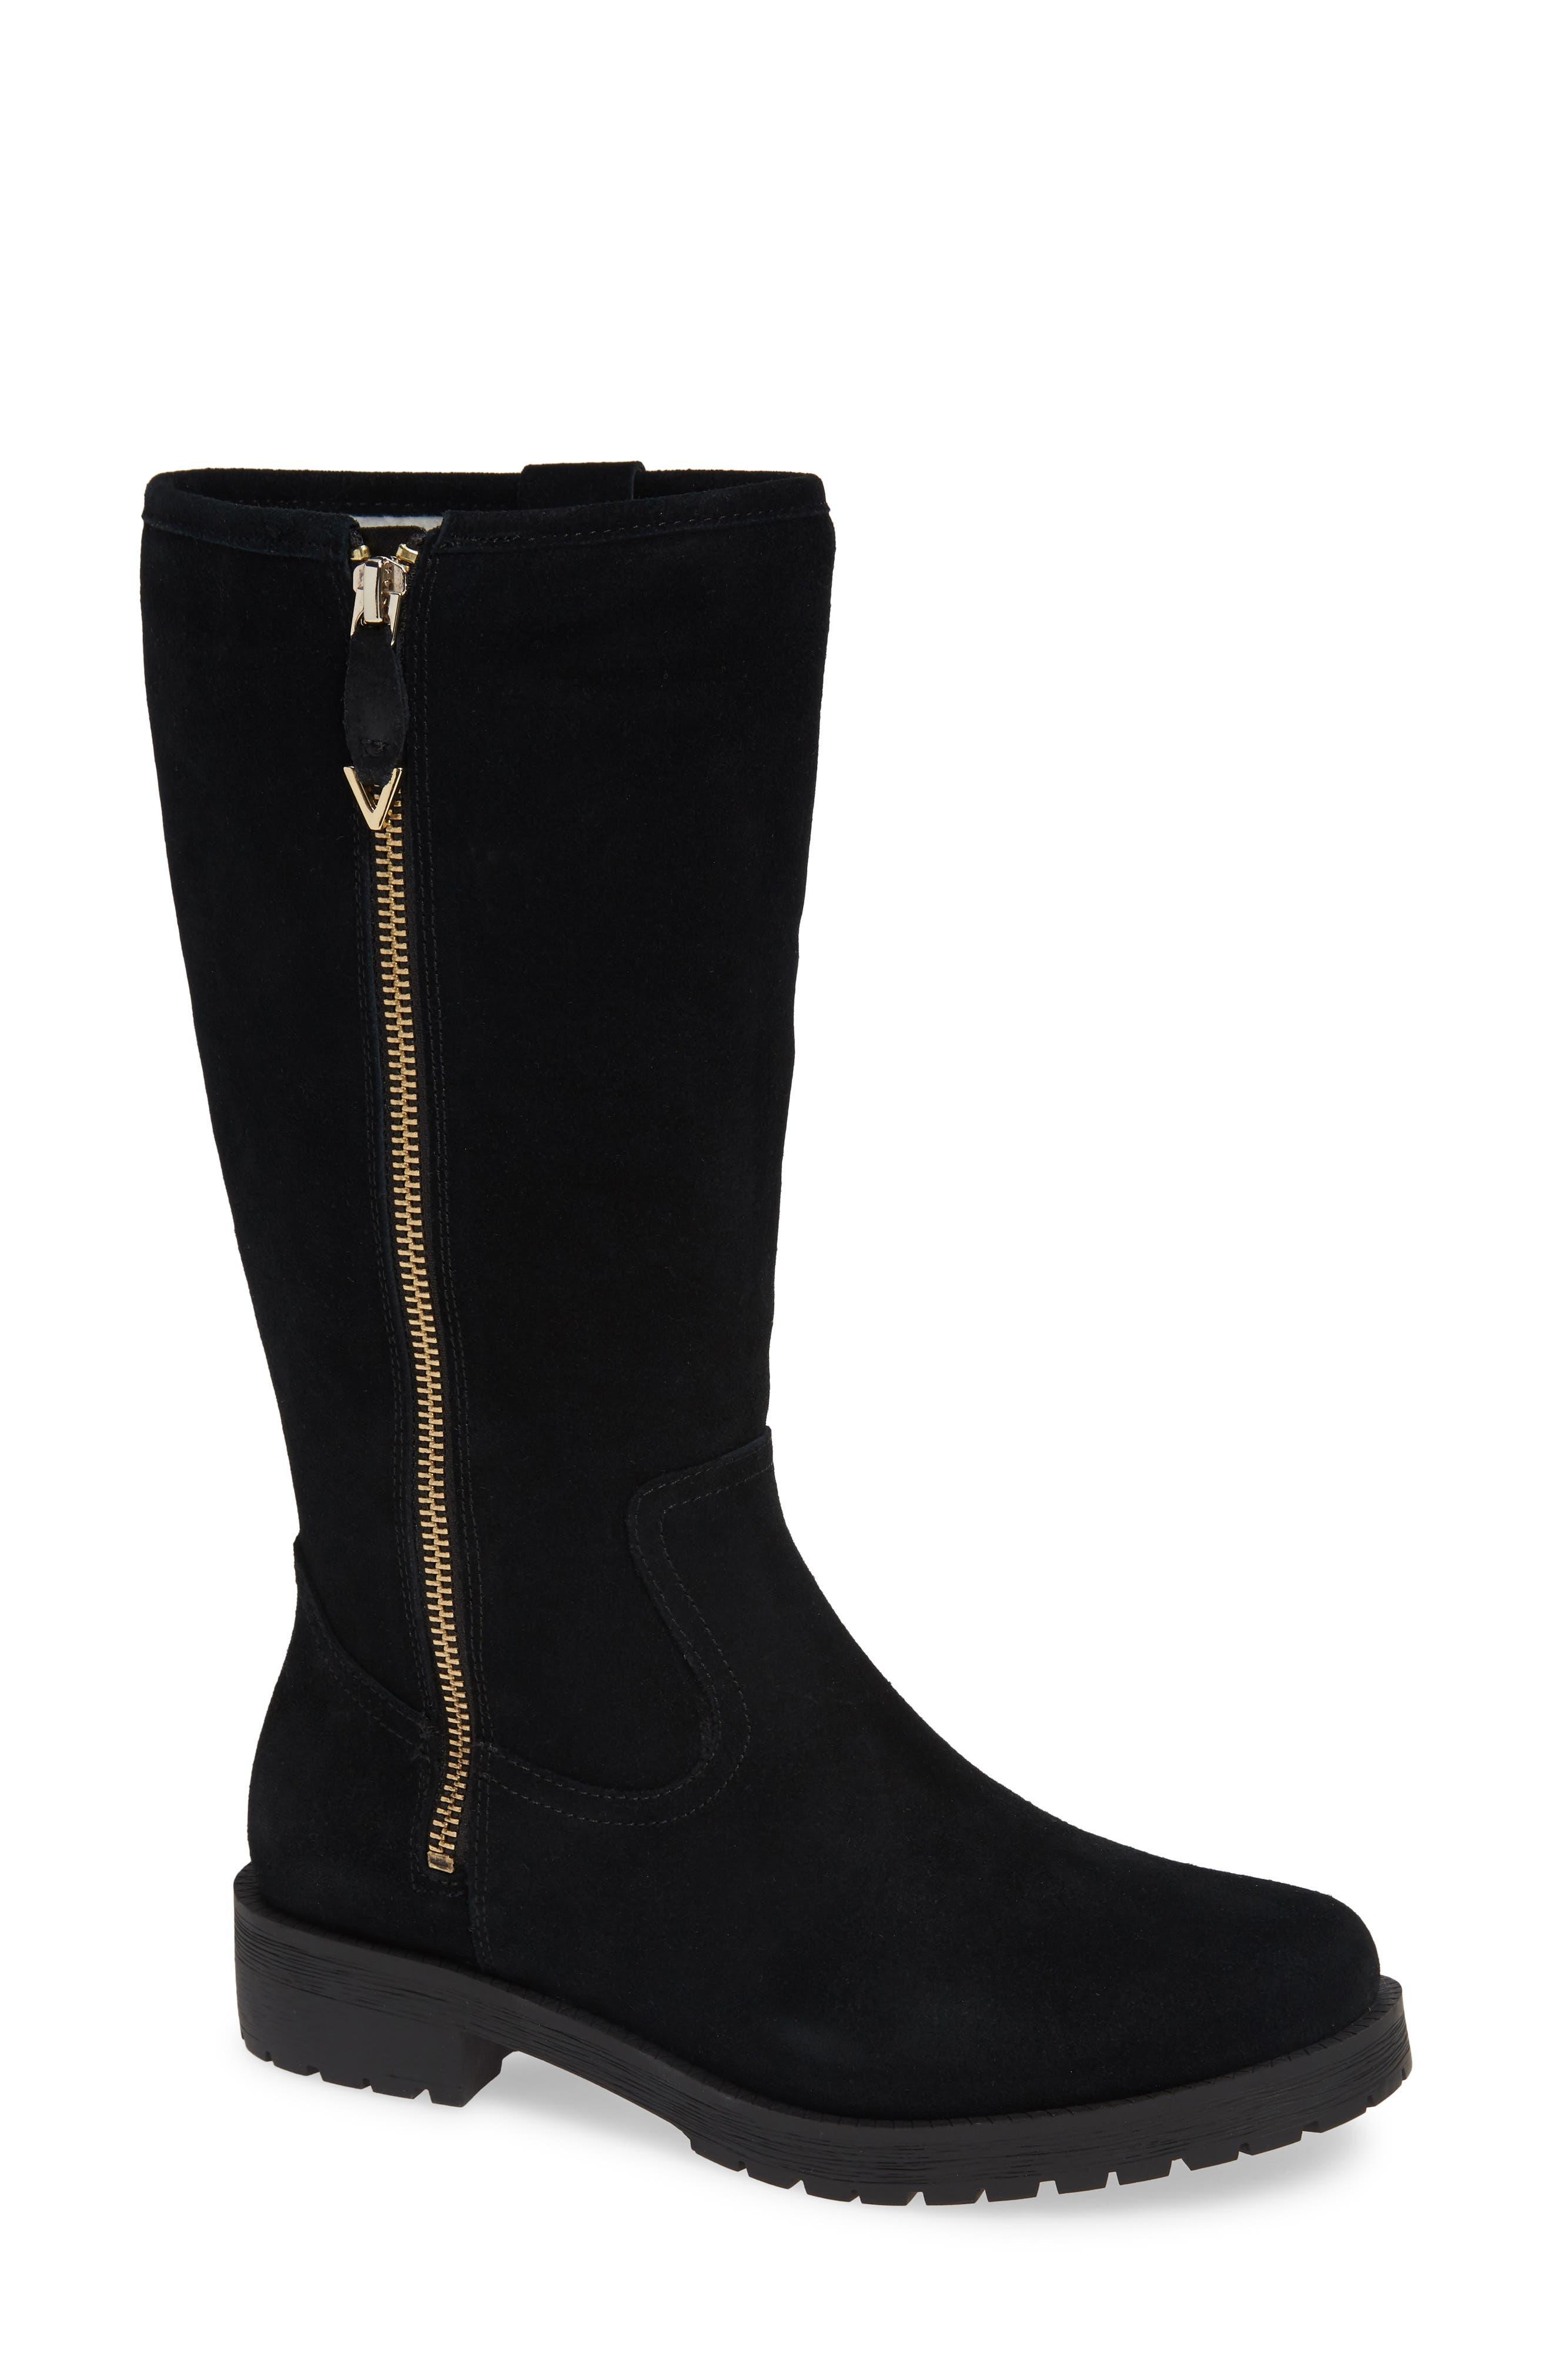 Vionic Mica Boot, Black